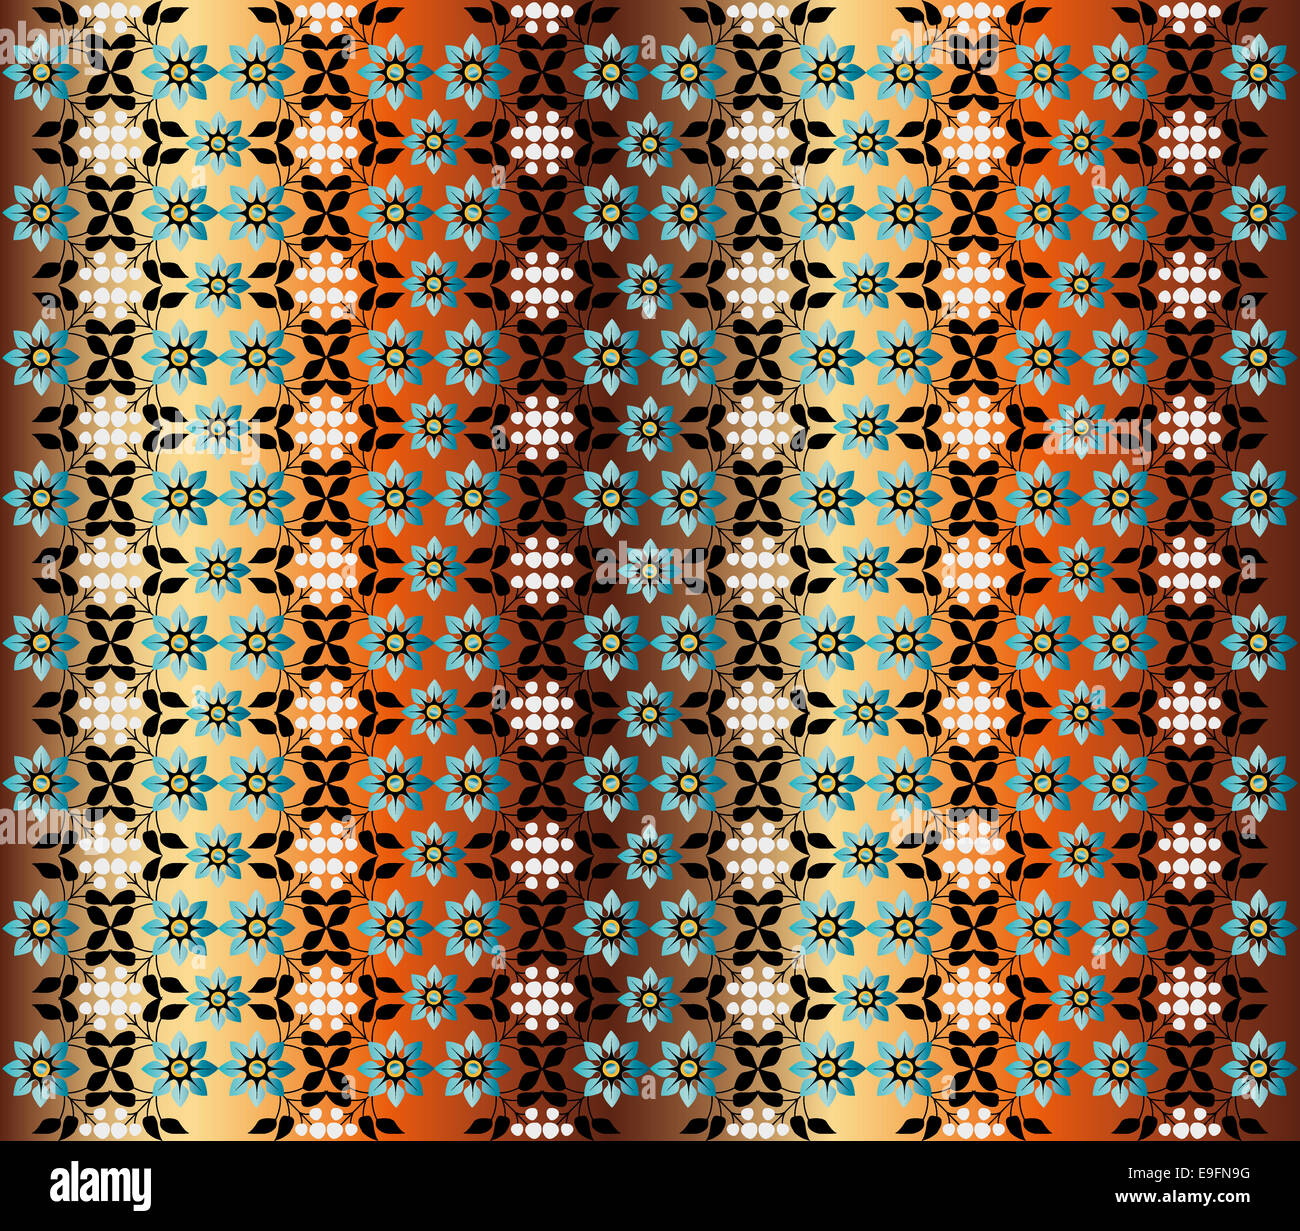 seamless pattern version - Stock Image